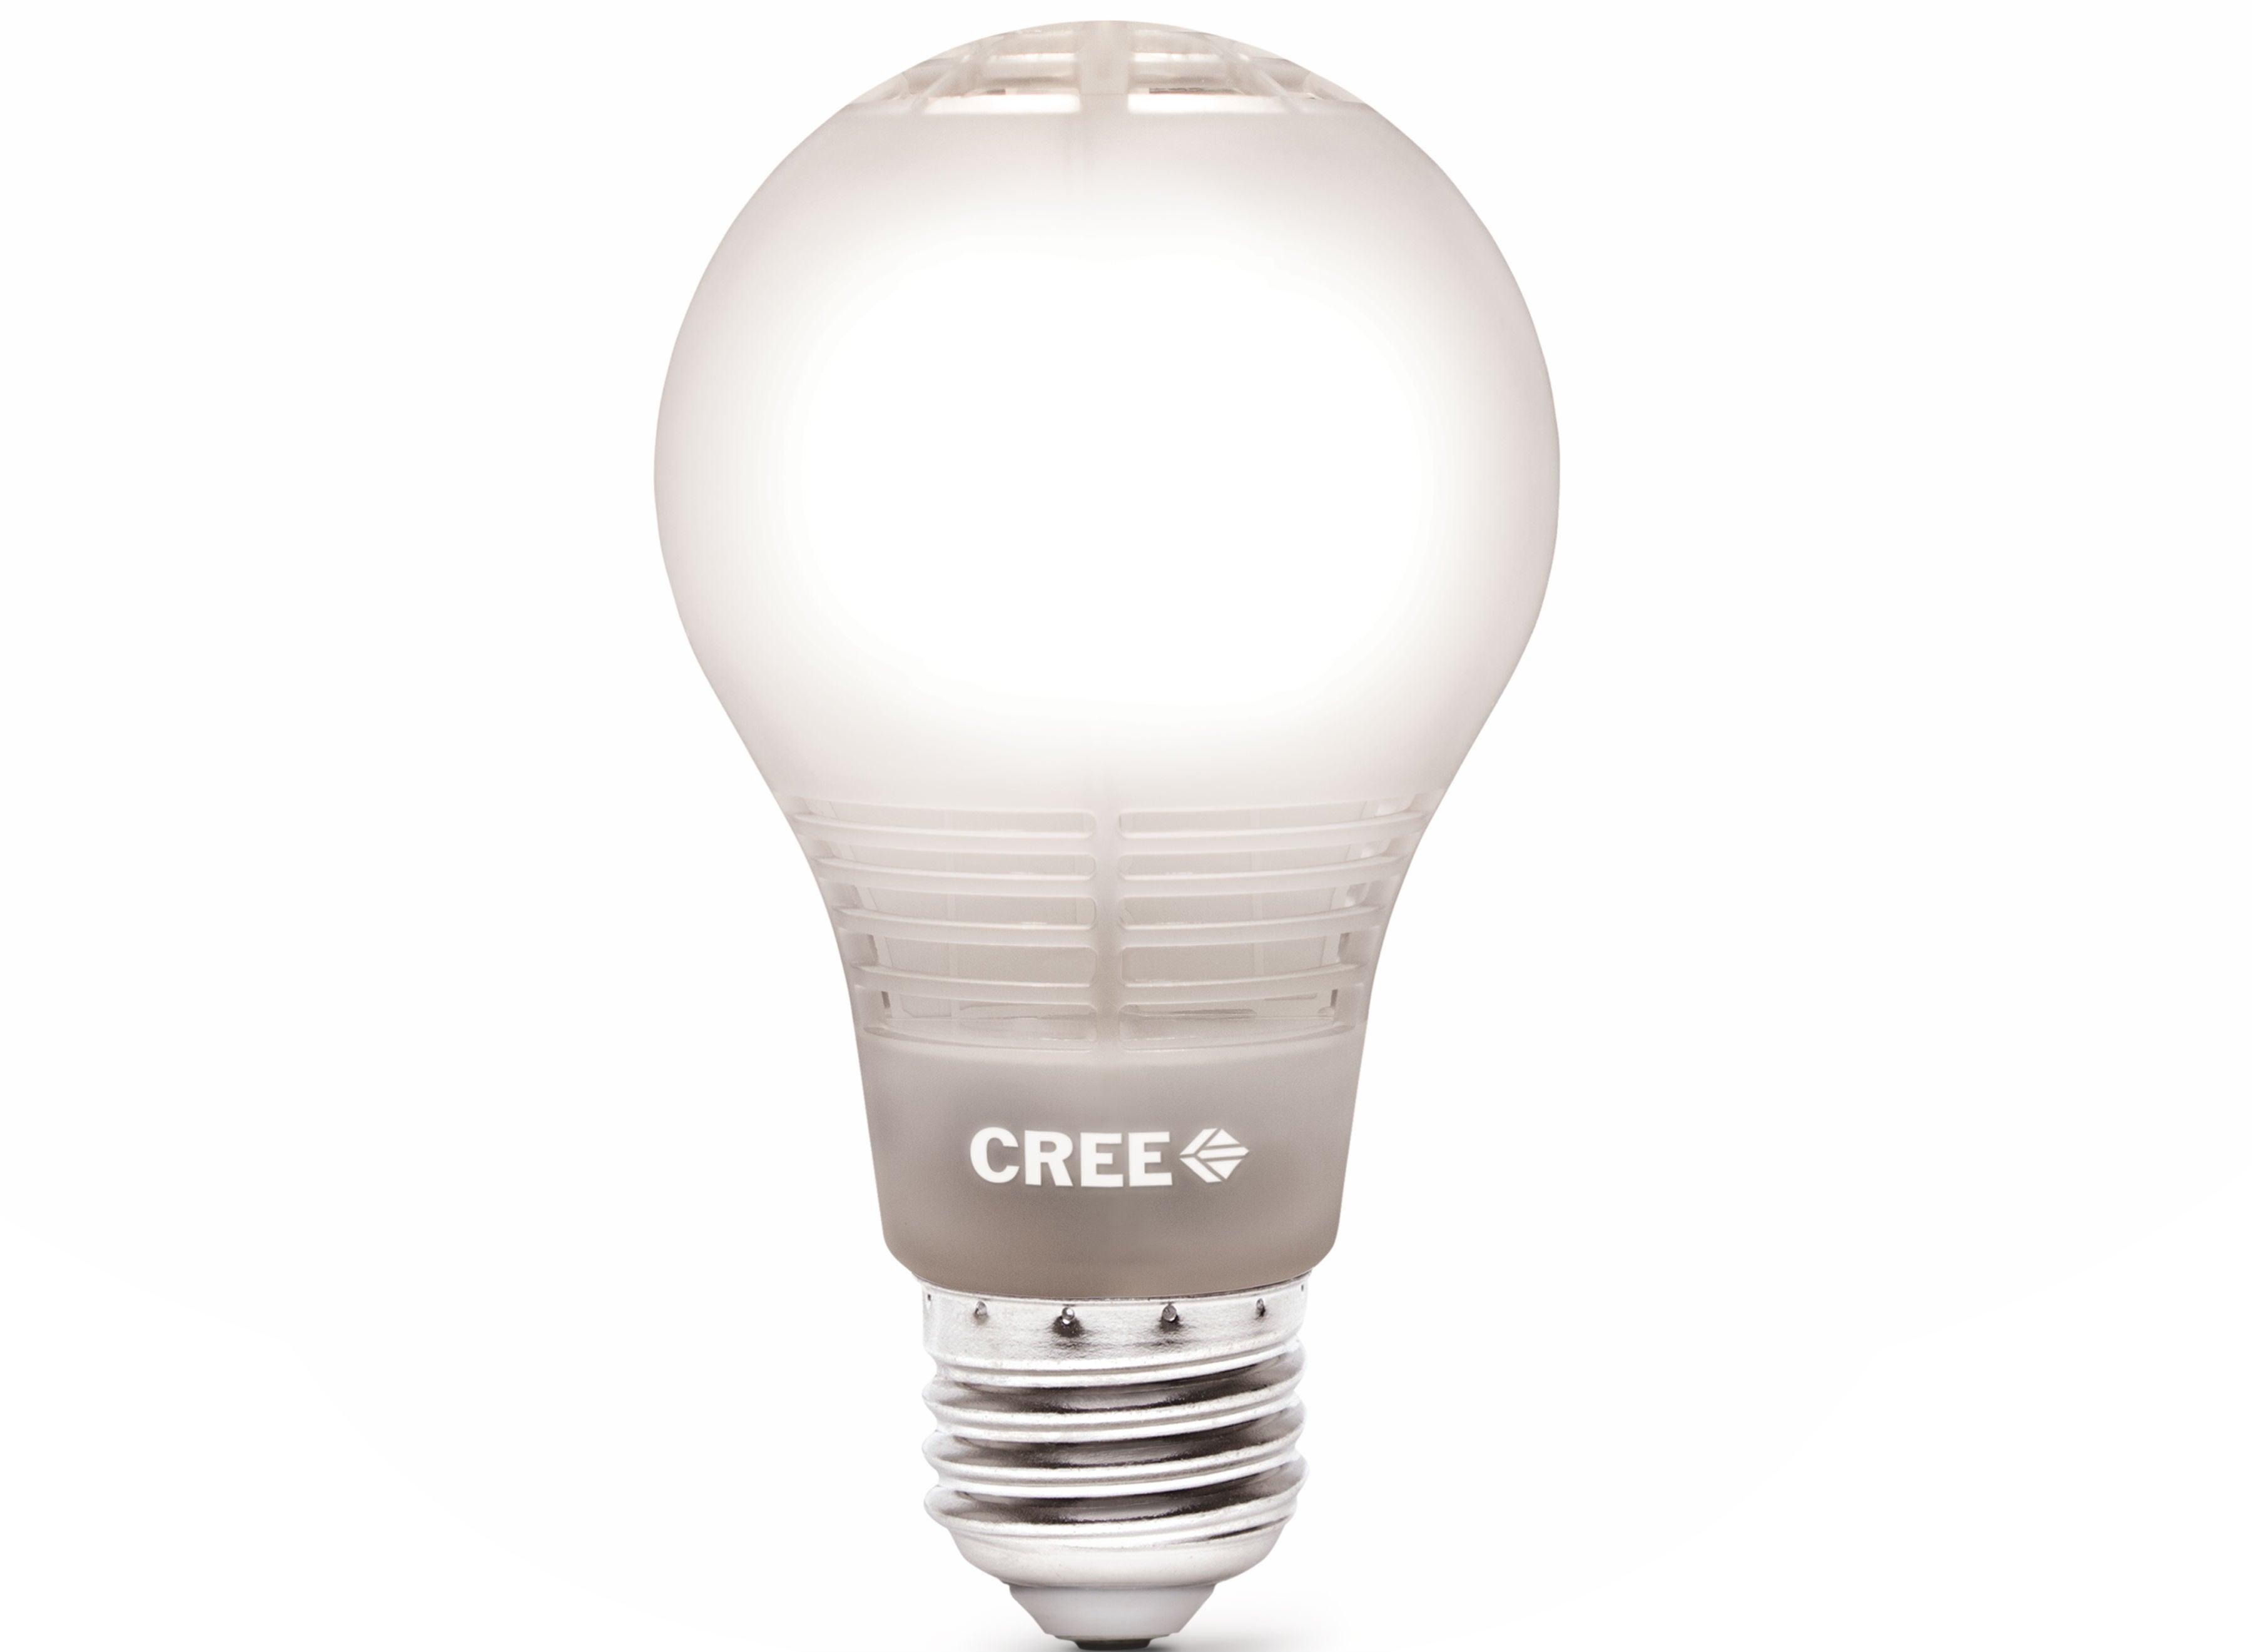 Cree's Latest LED Lightbulb Is a Bright Bargain